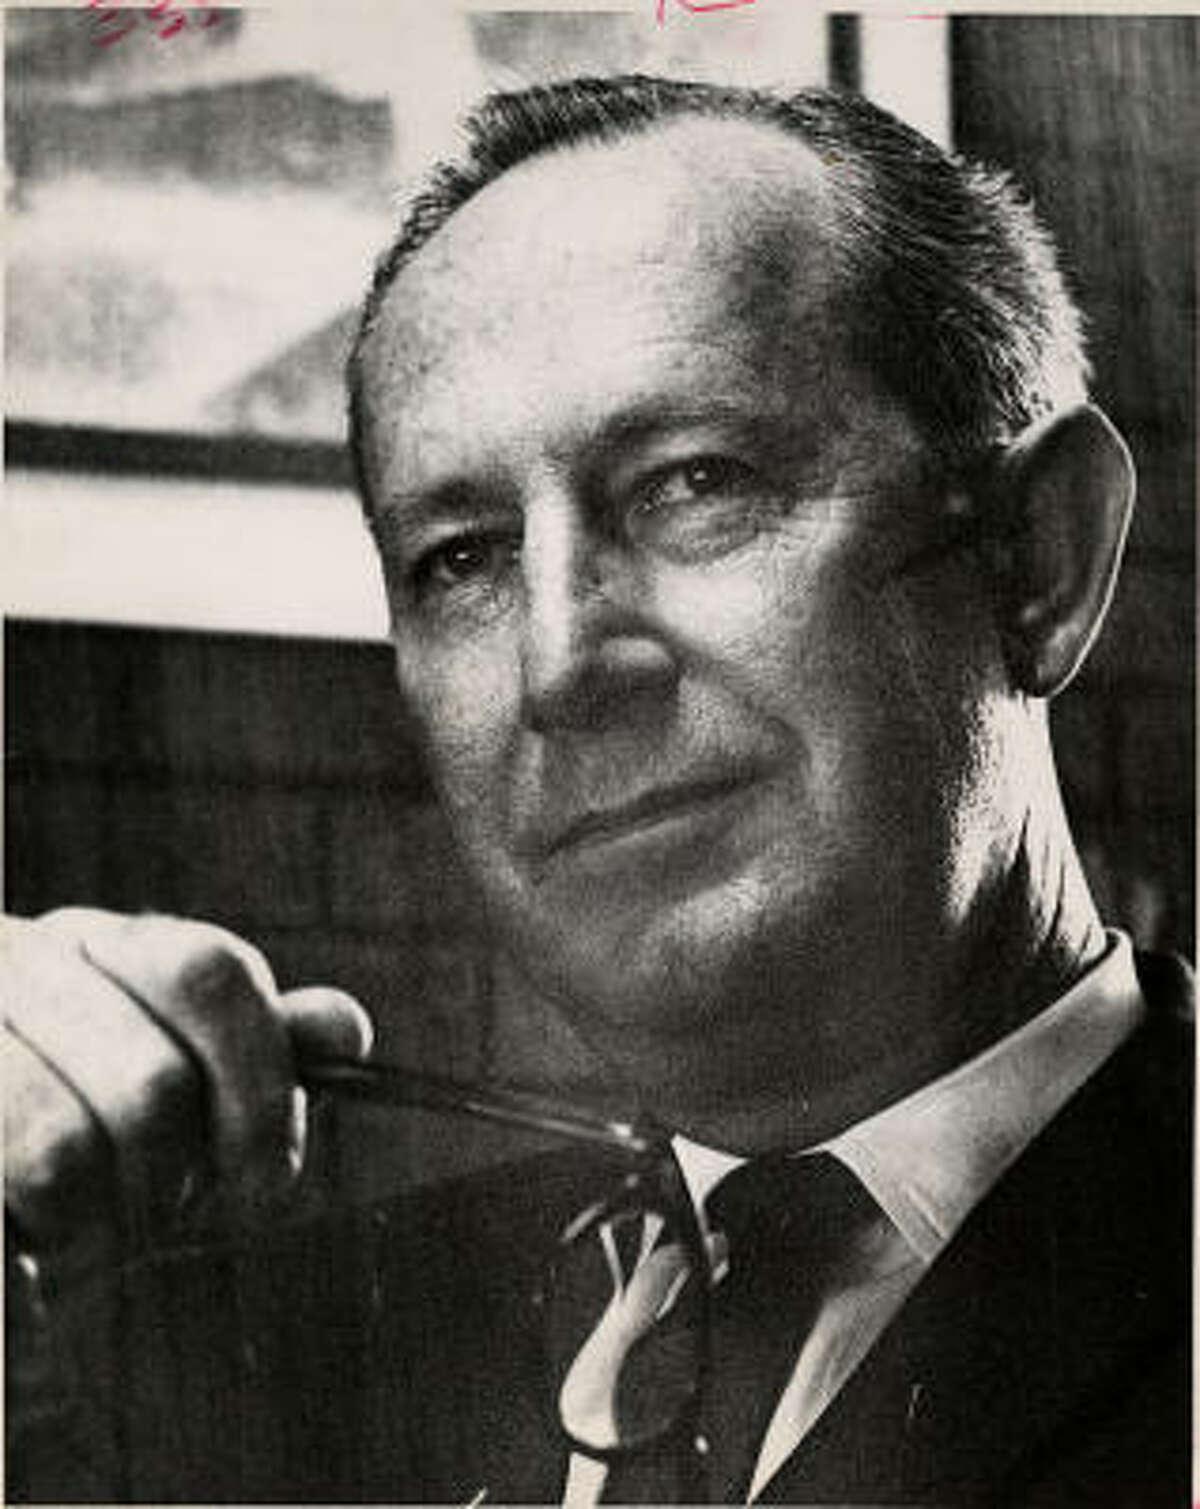 Arleigh Templeton, shown in 1963.